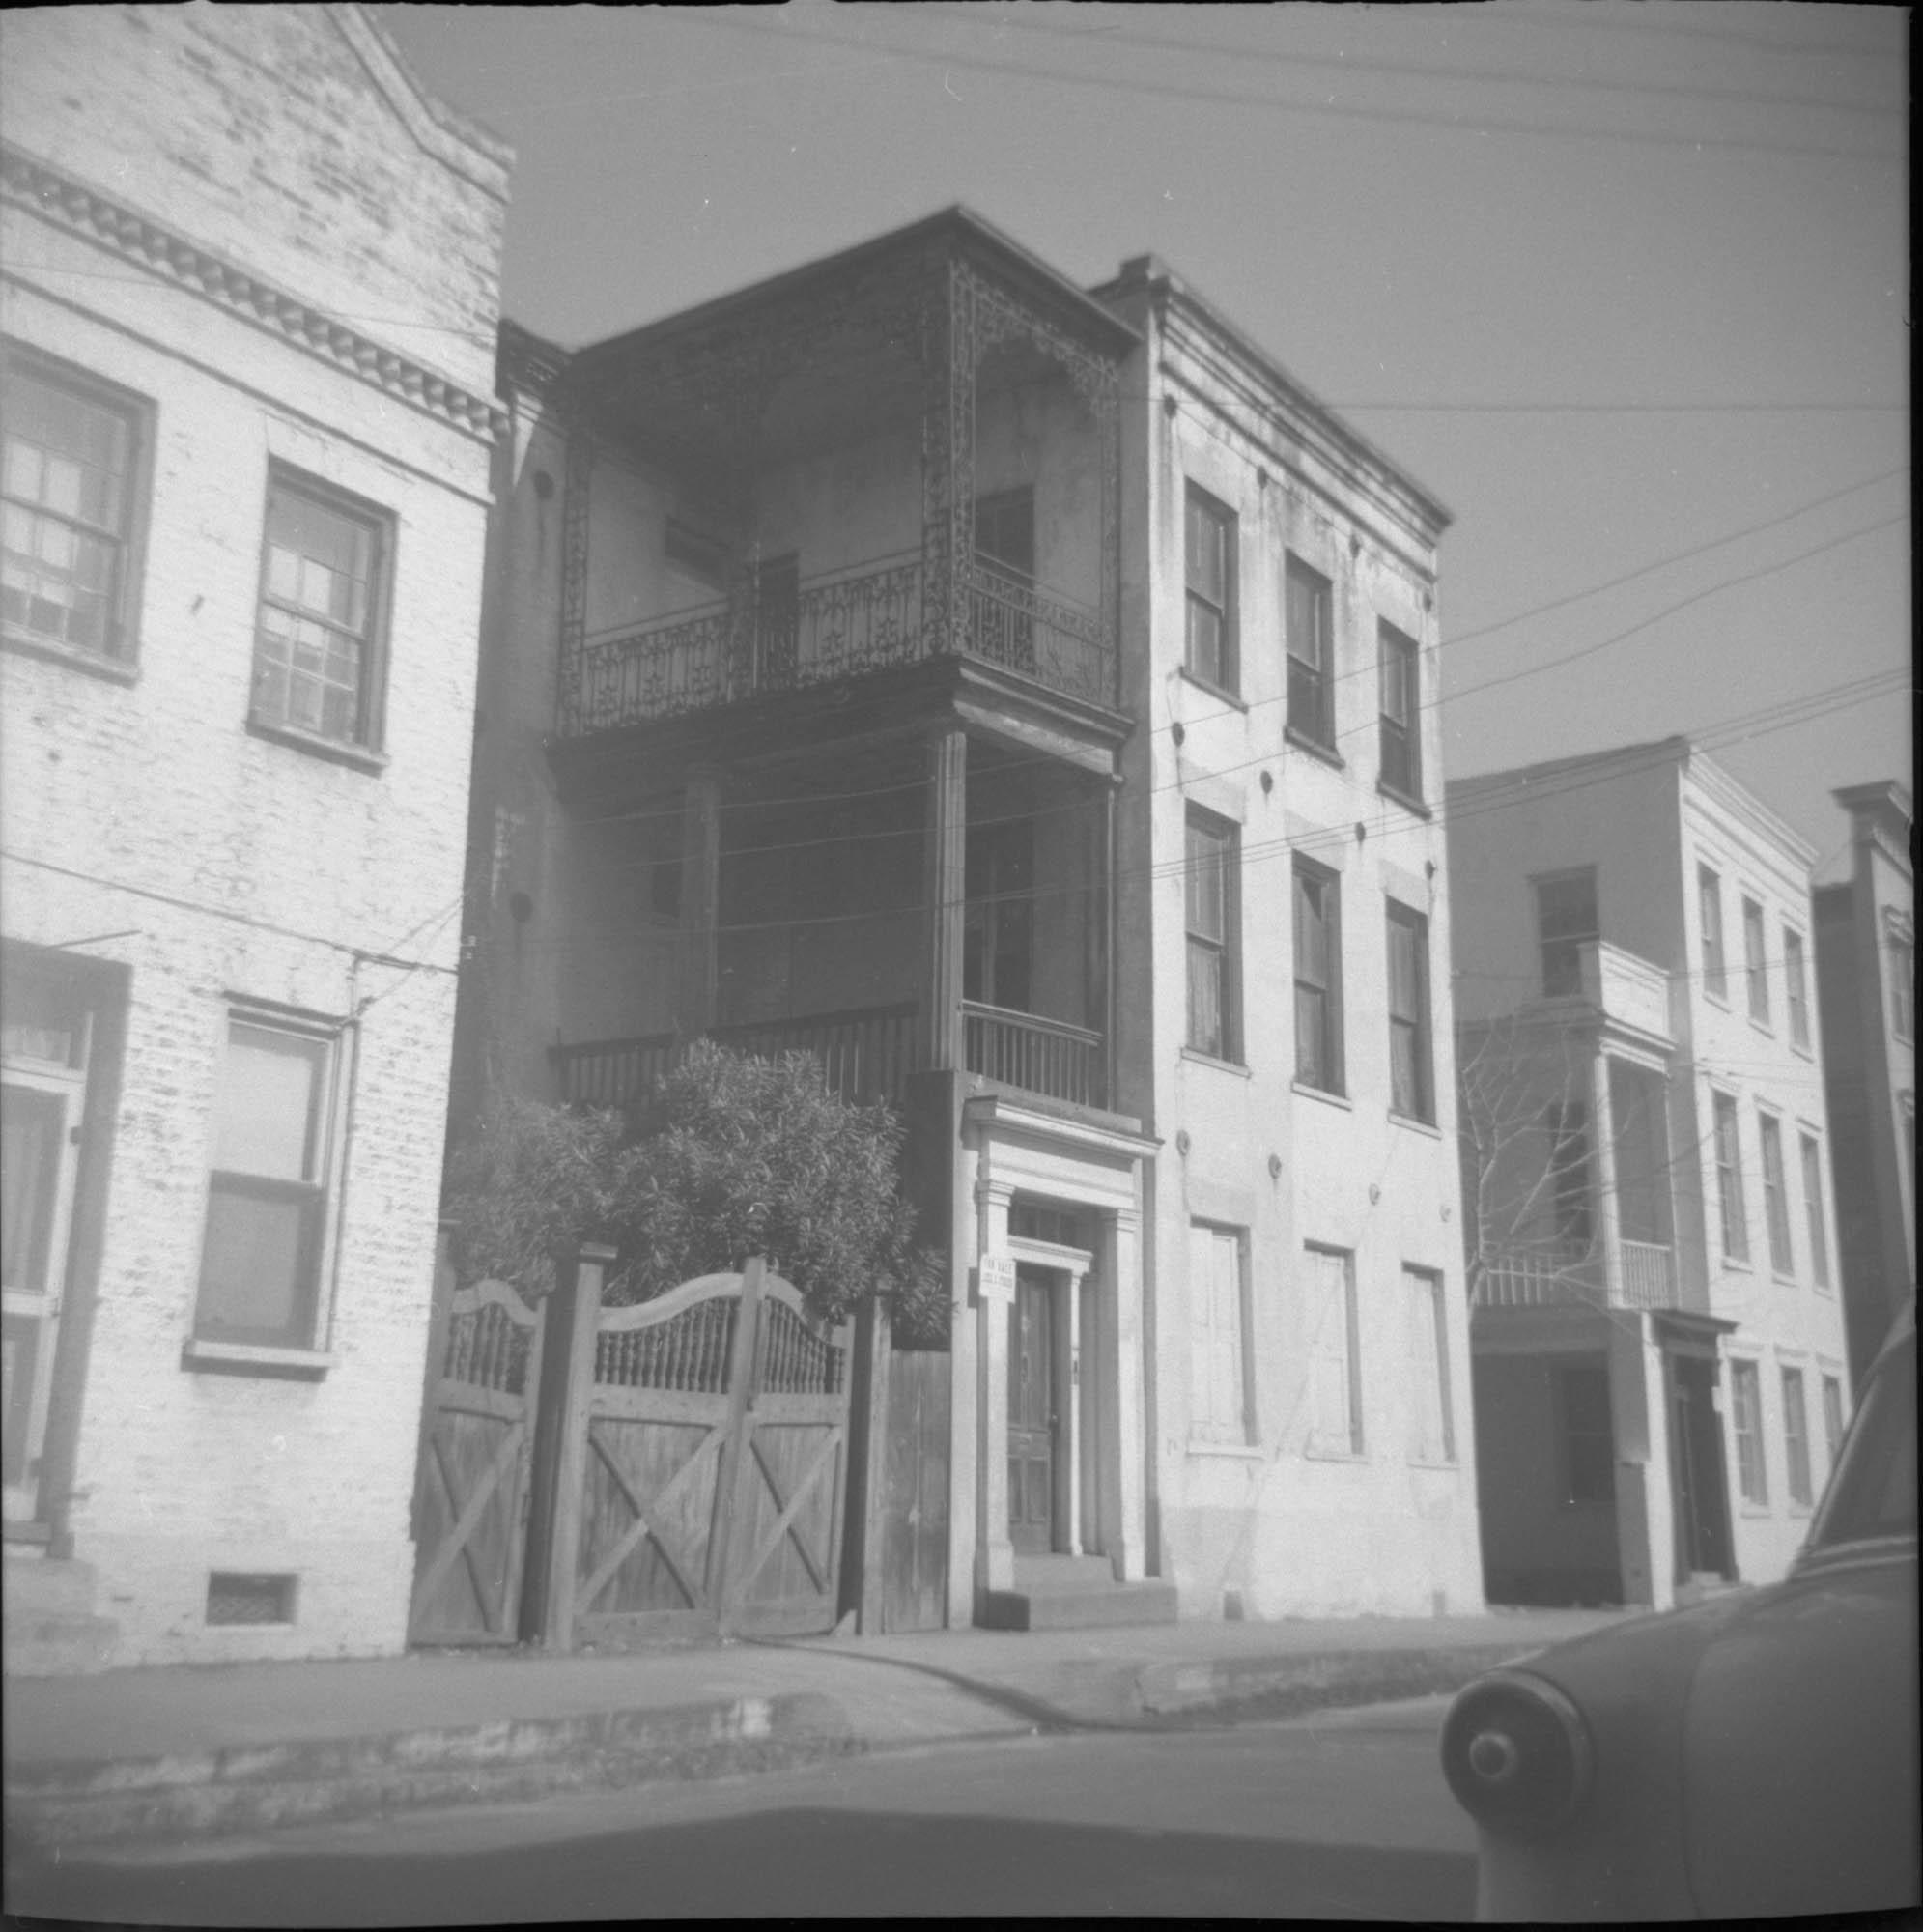 66 Society Street